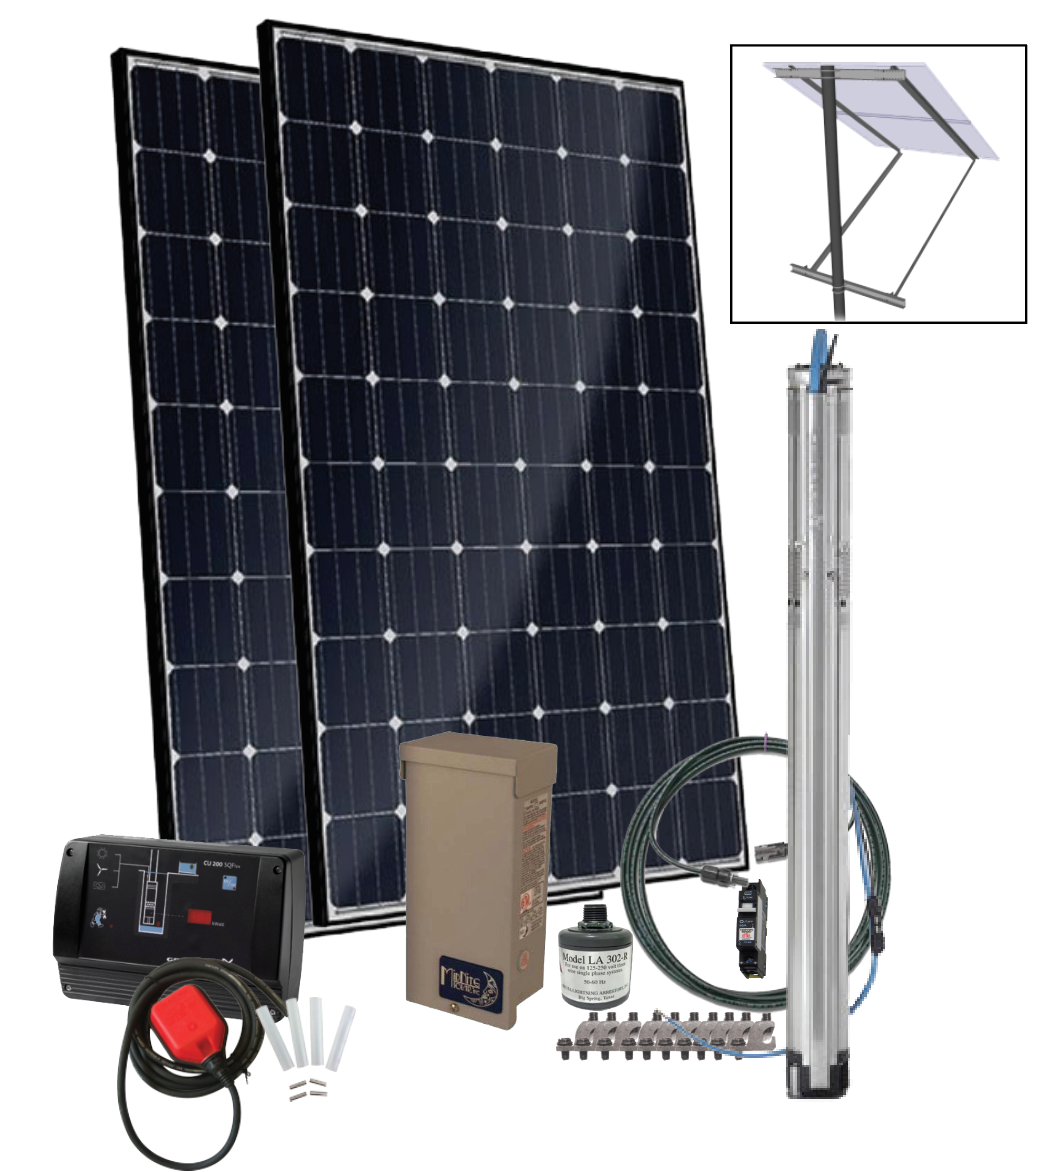 Grundfos SQFlex Pre-designed Solar Water Pumping Kit using 11 sqf-2 pump 10  to 8 gpm, 50 to 125 feet lift